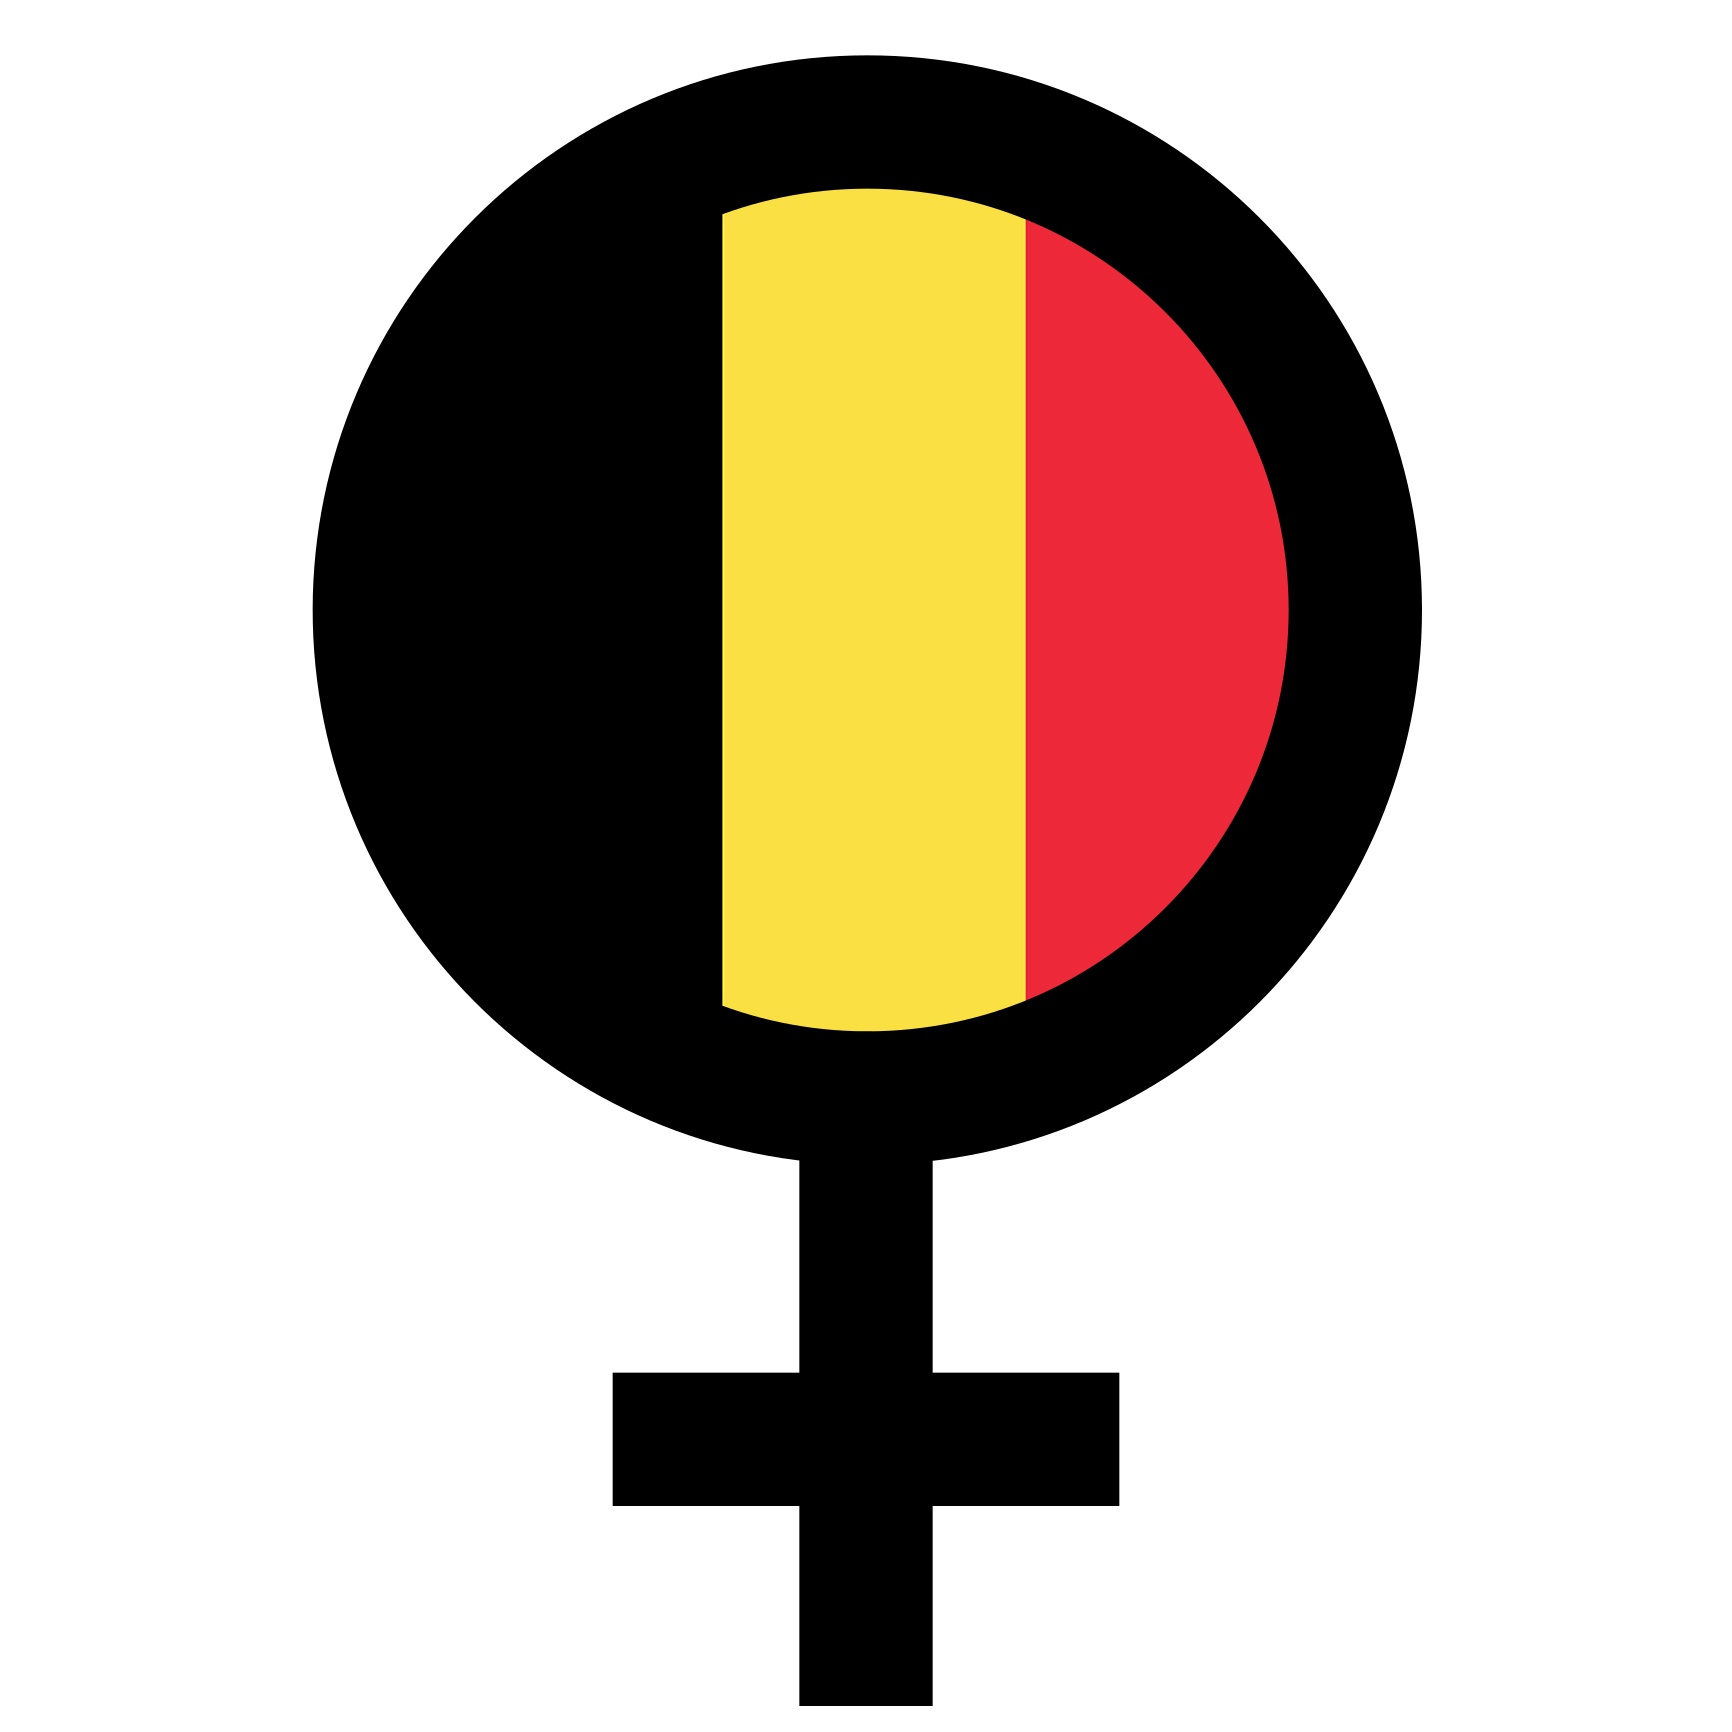 Belgian female symbol